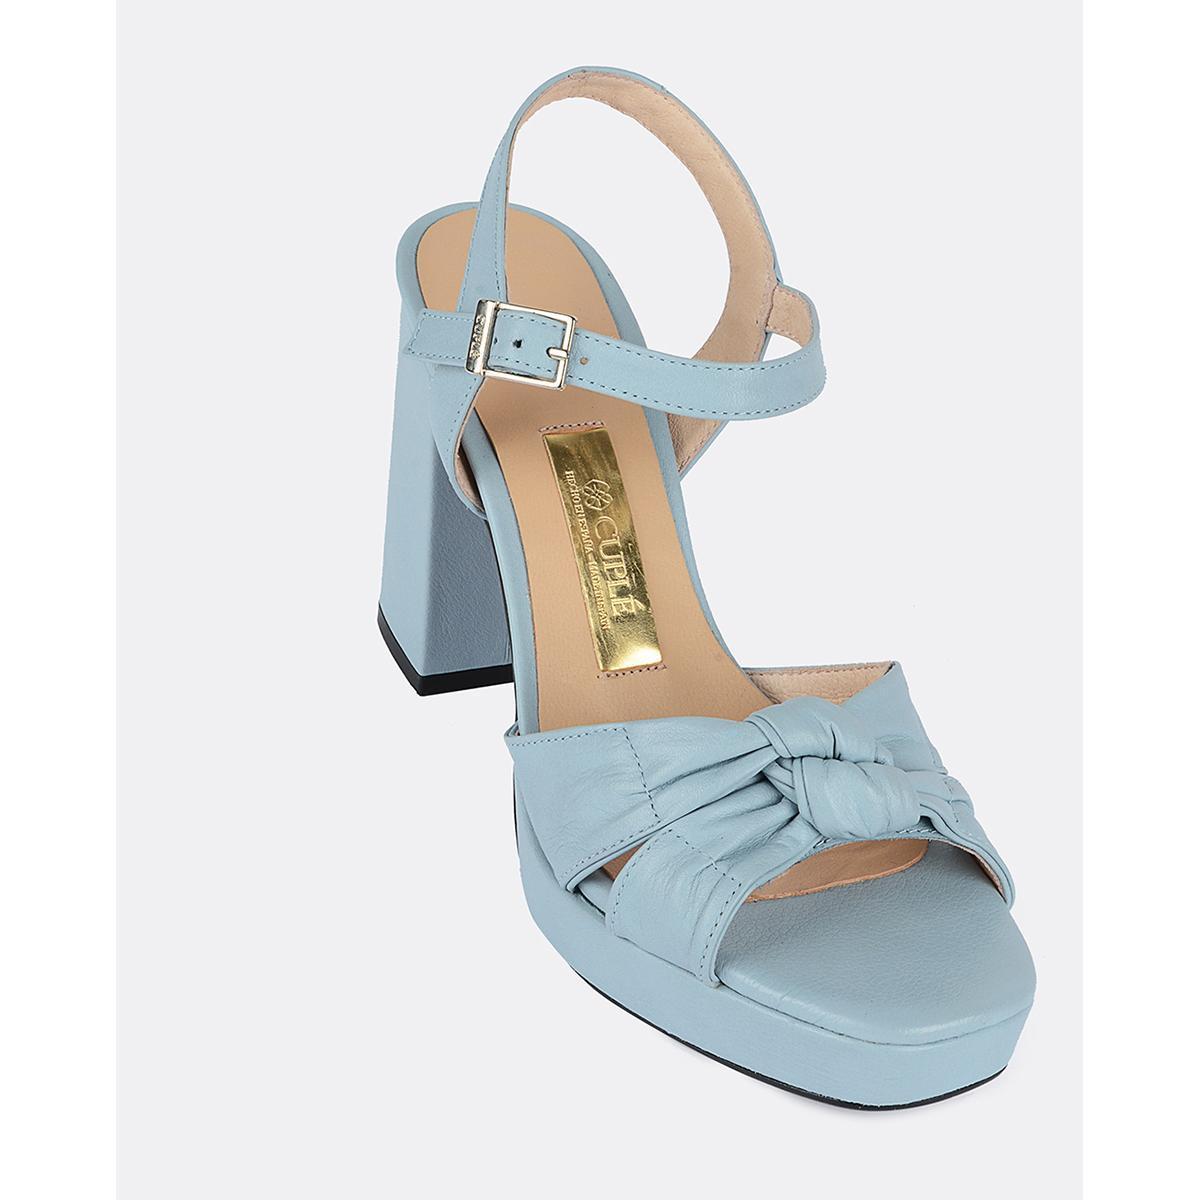 Tacon Cuple Zapatos Mujer De Celeste Piel Wq1wzr nPO8k0w